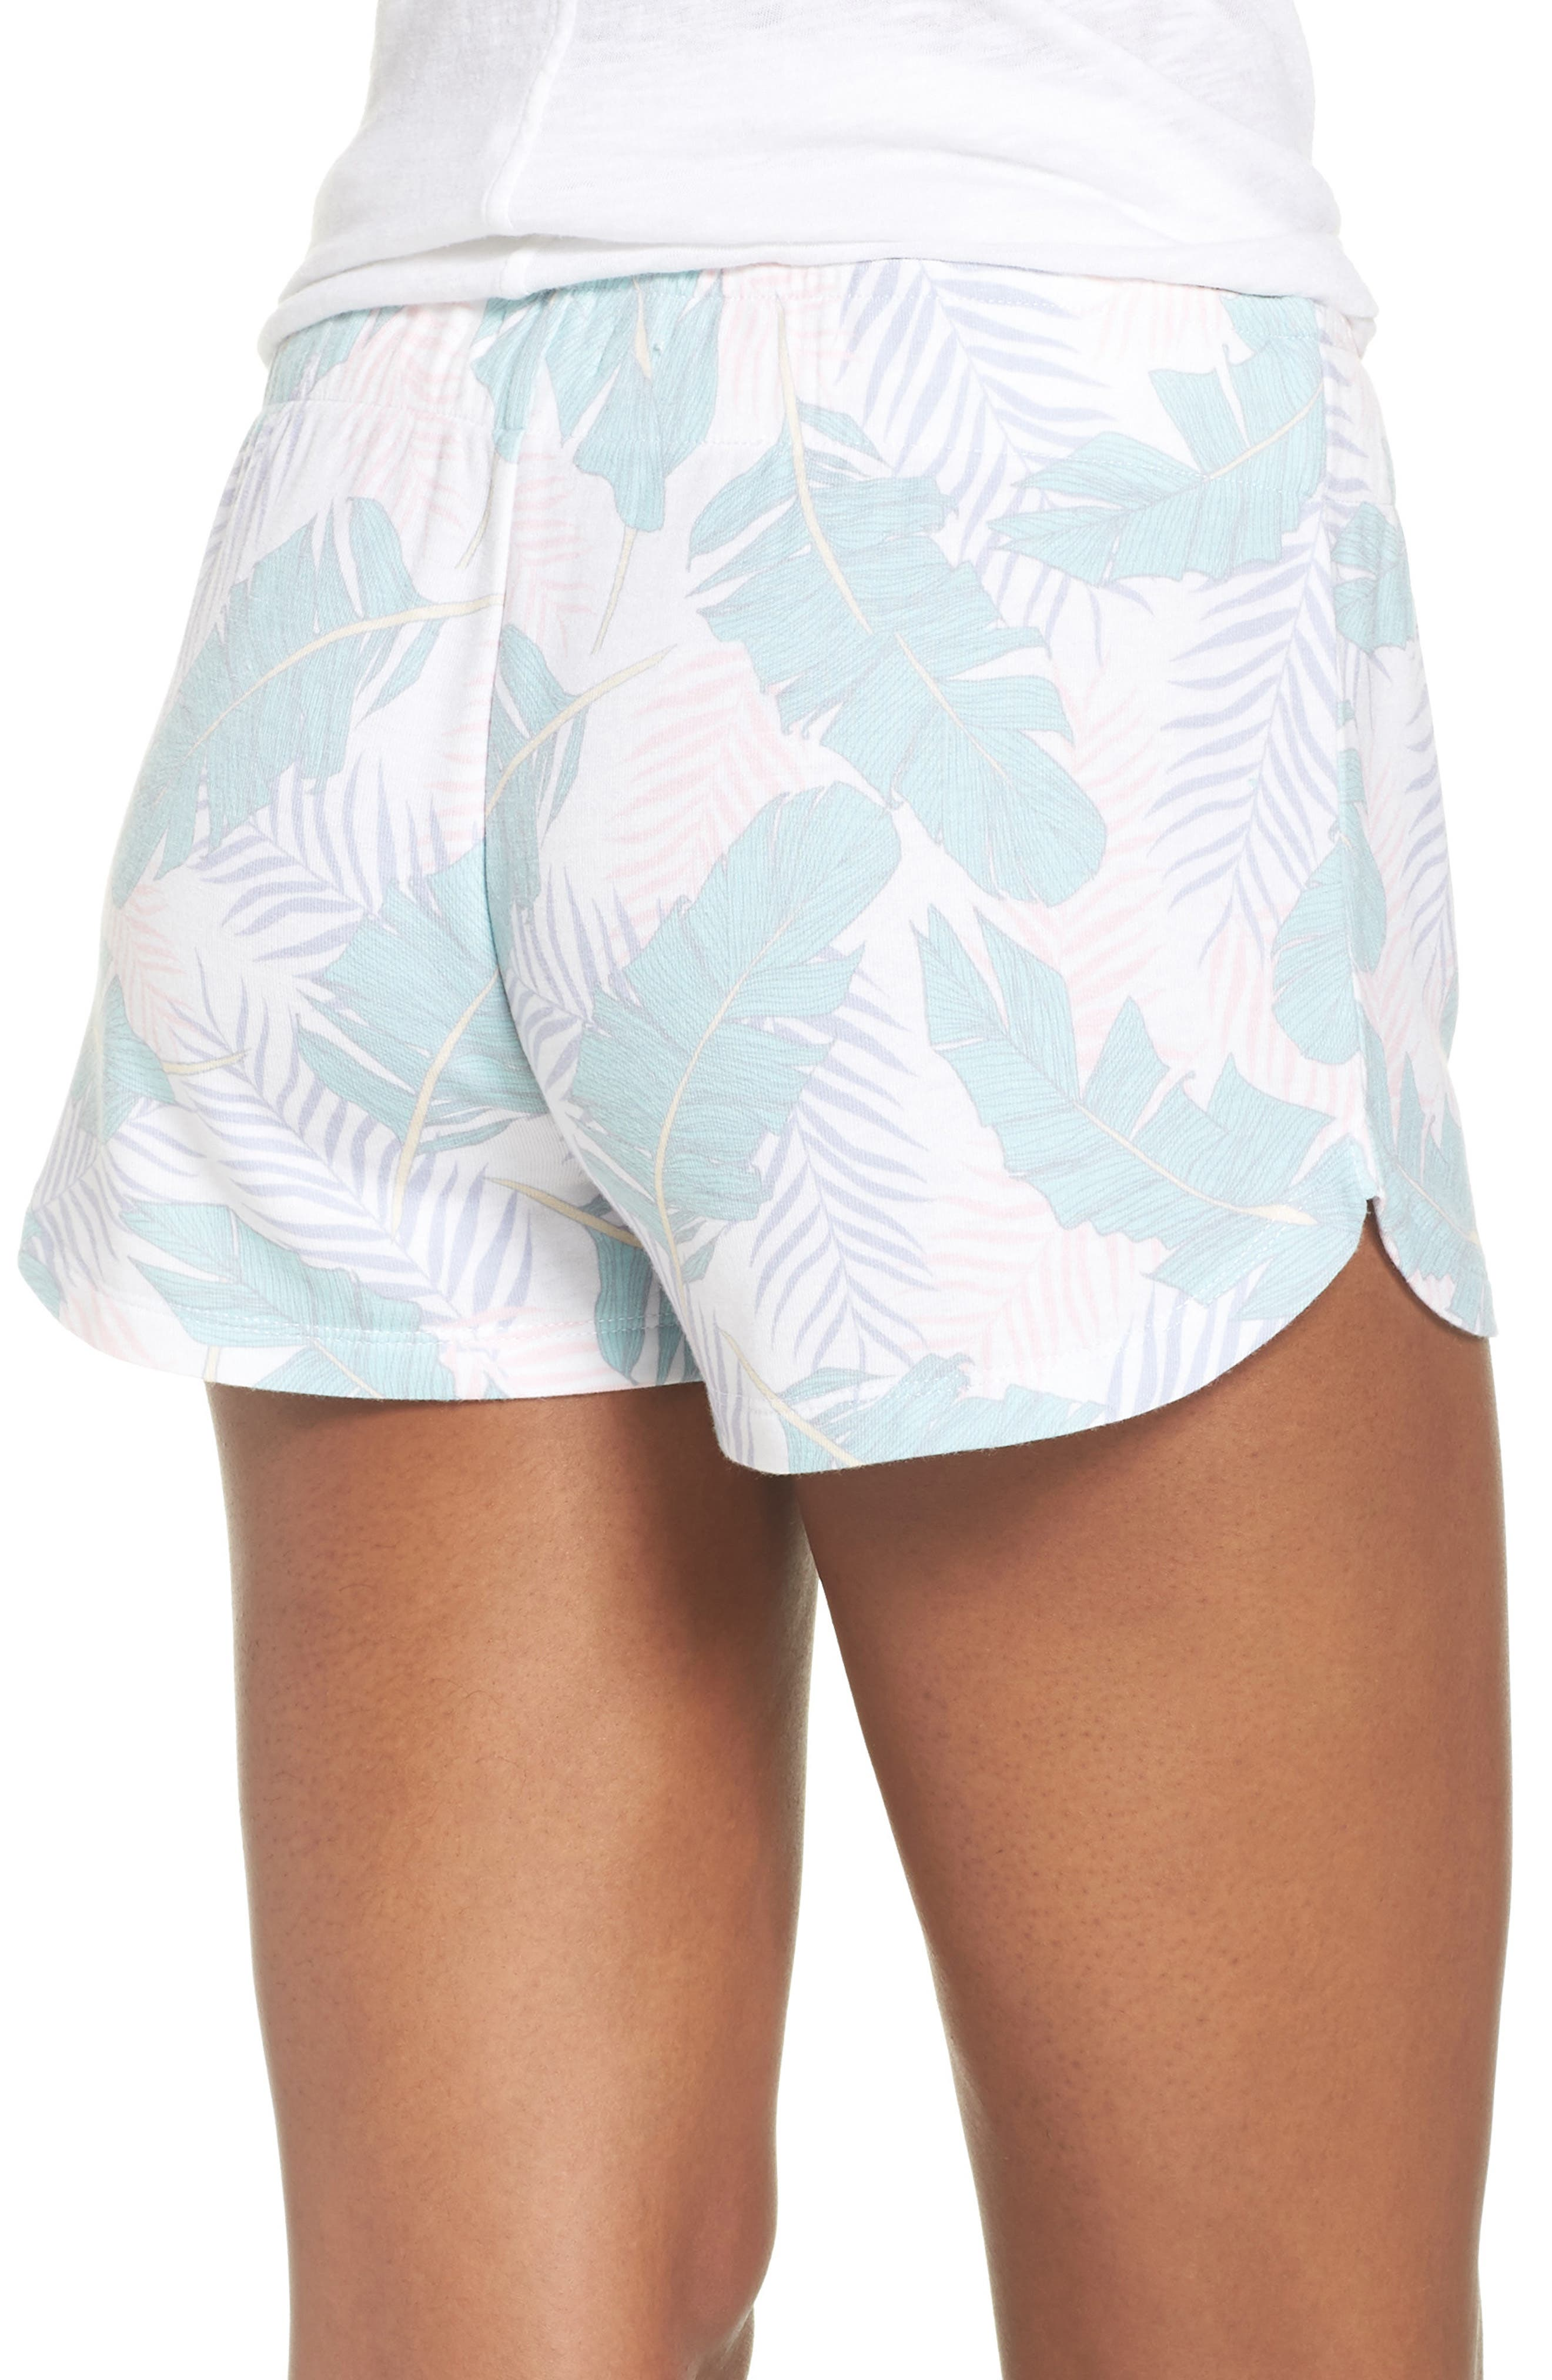 Lounge Shorts,                             Alternate thumbnail 2, color,